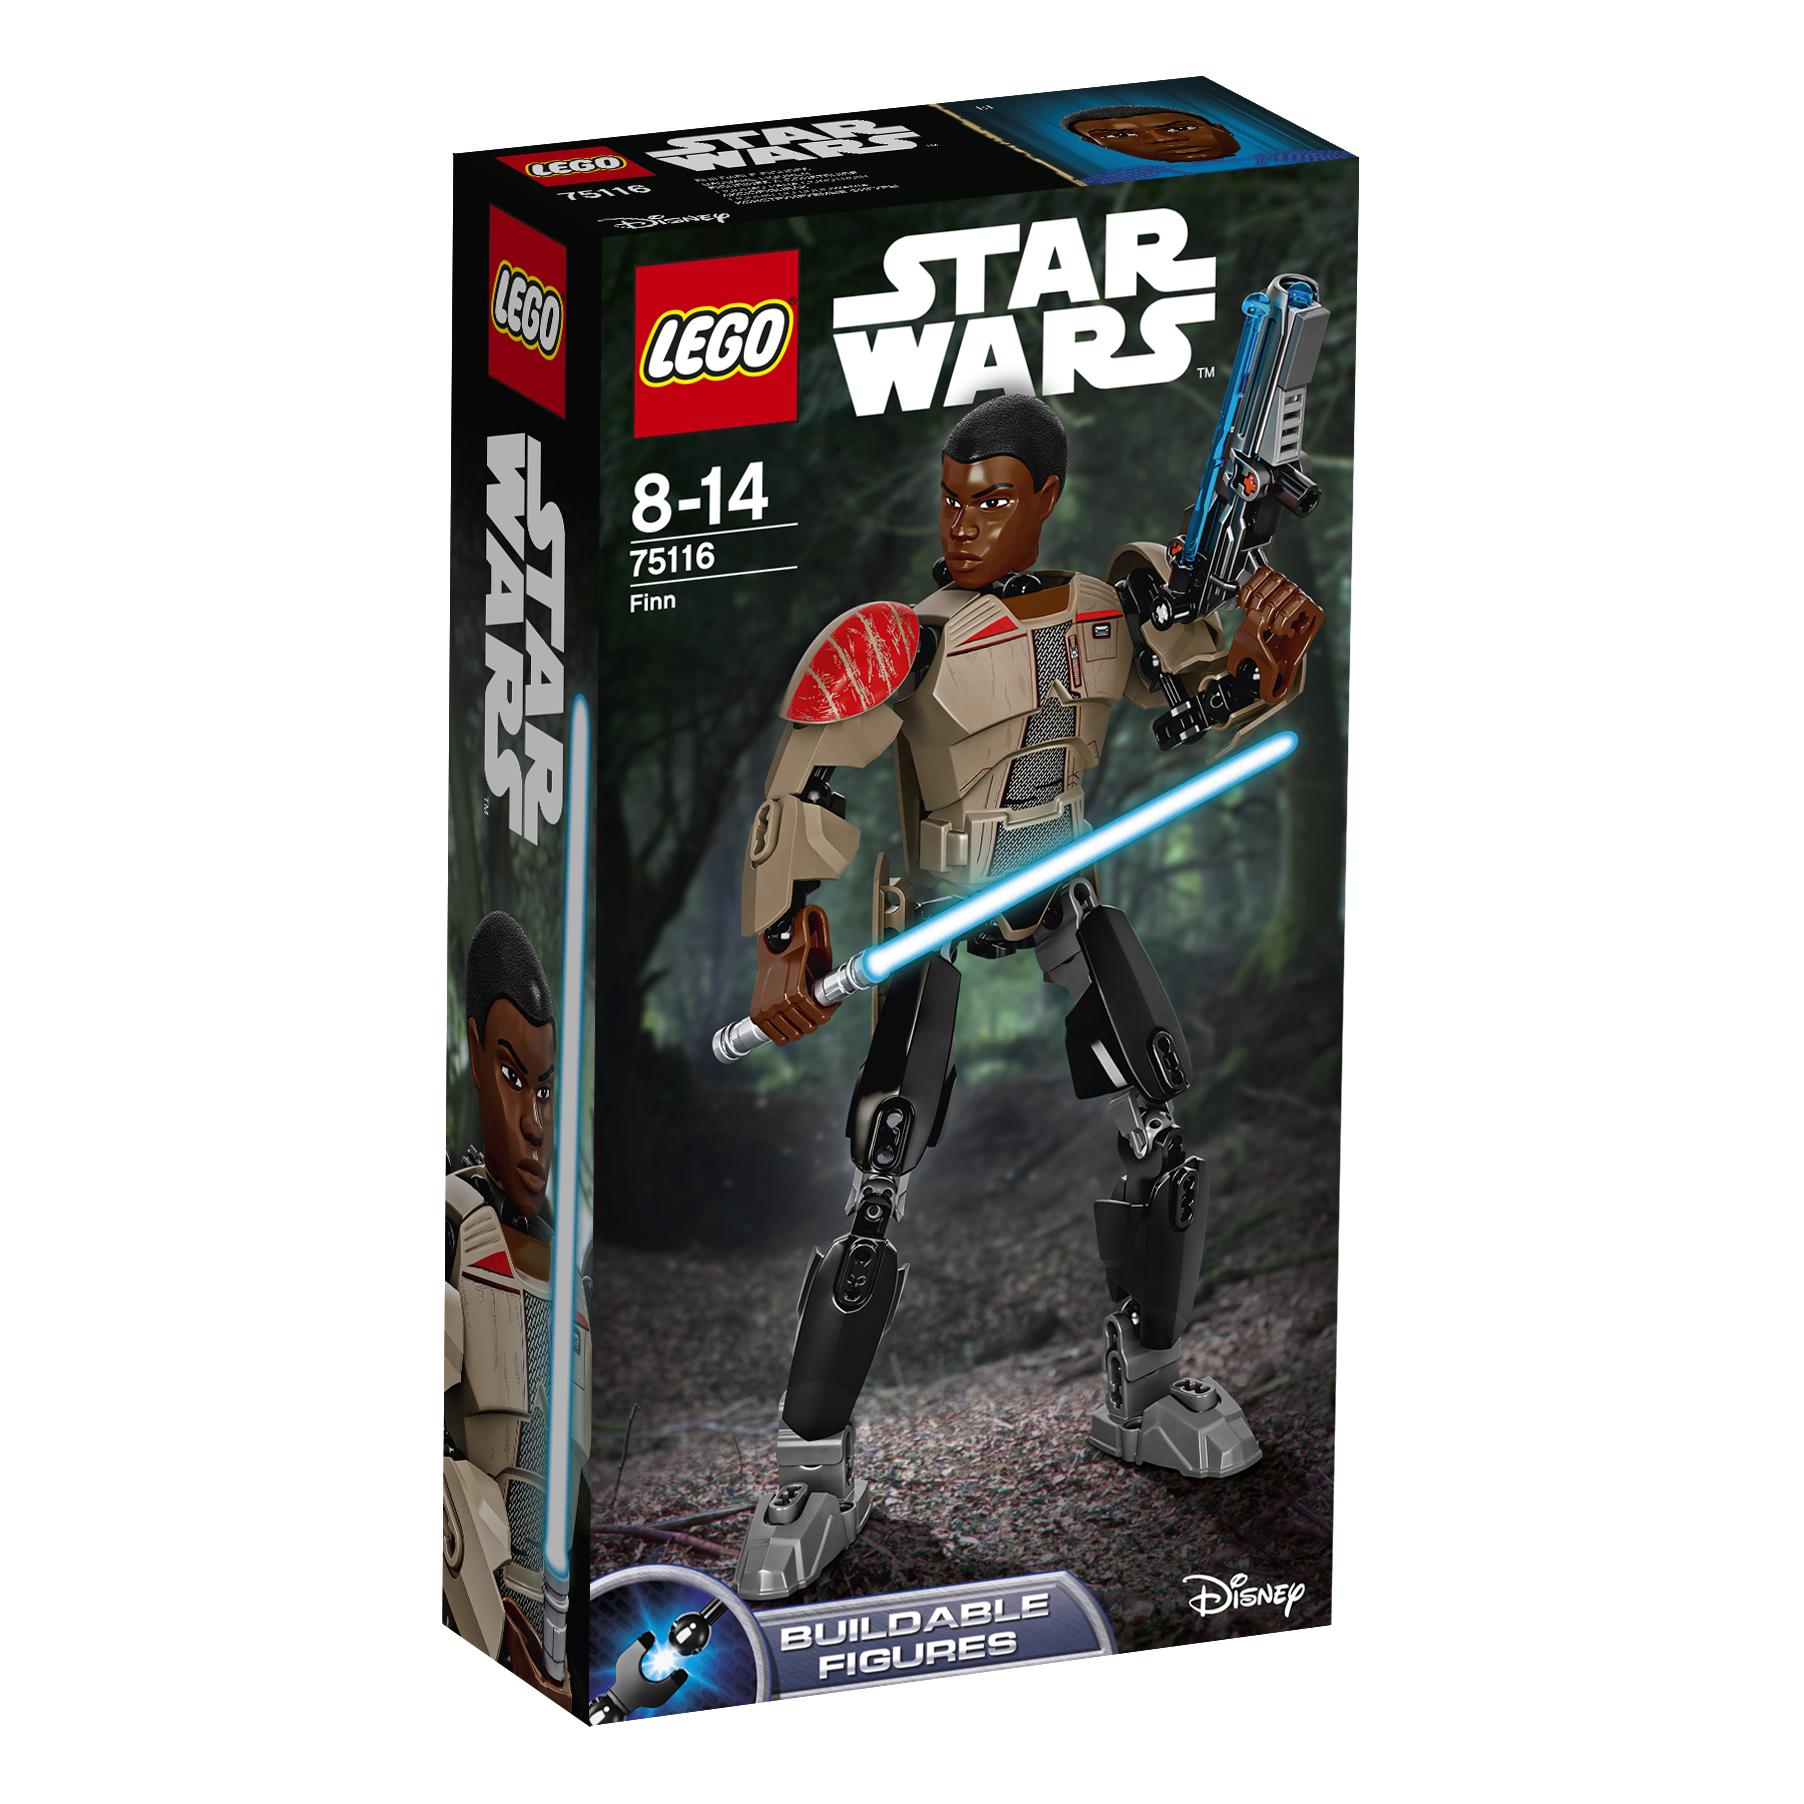 Konstruktorius LEGO Star Wars™ Constraction Finas 8-14 m. vaikams (75116)